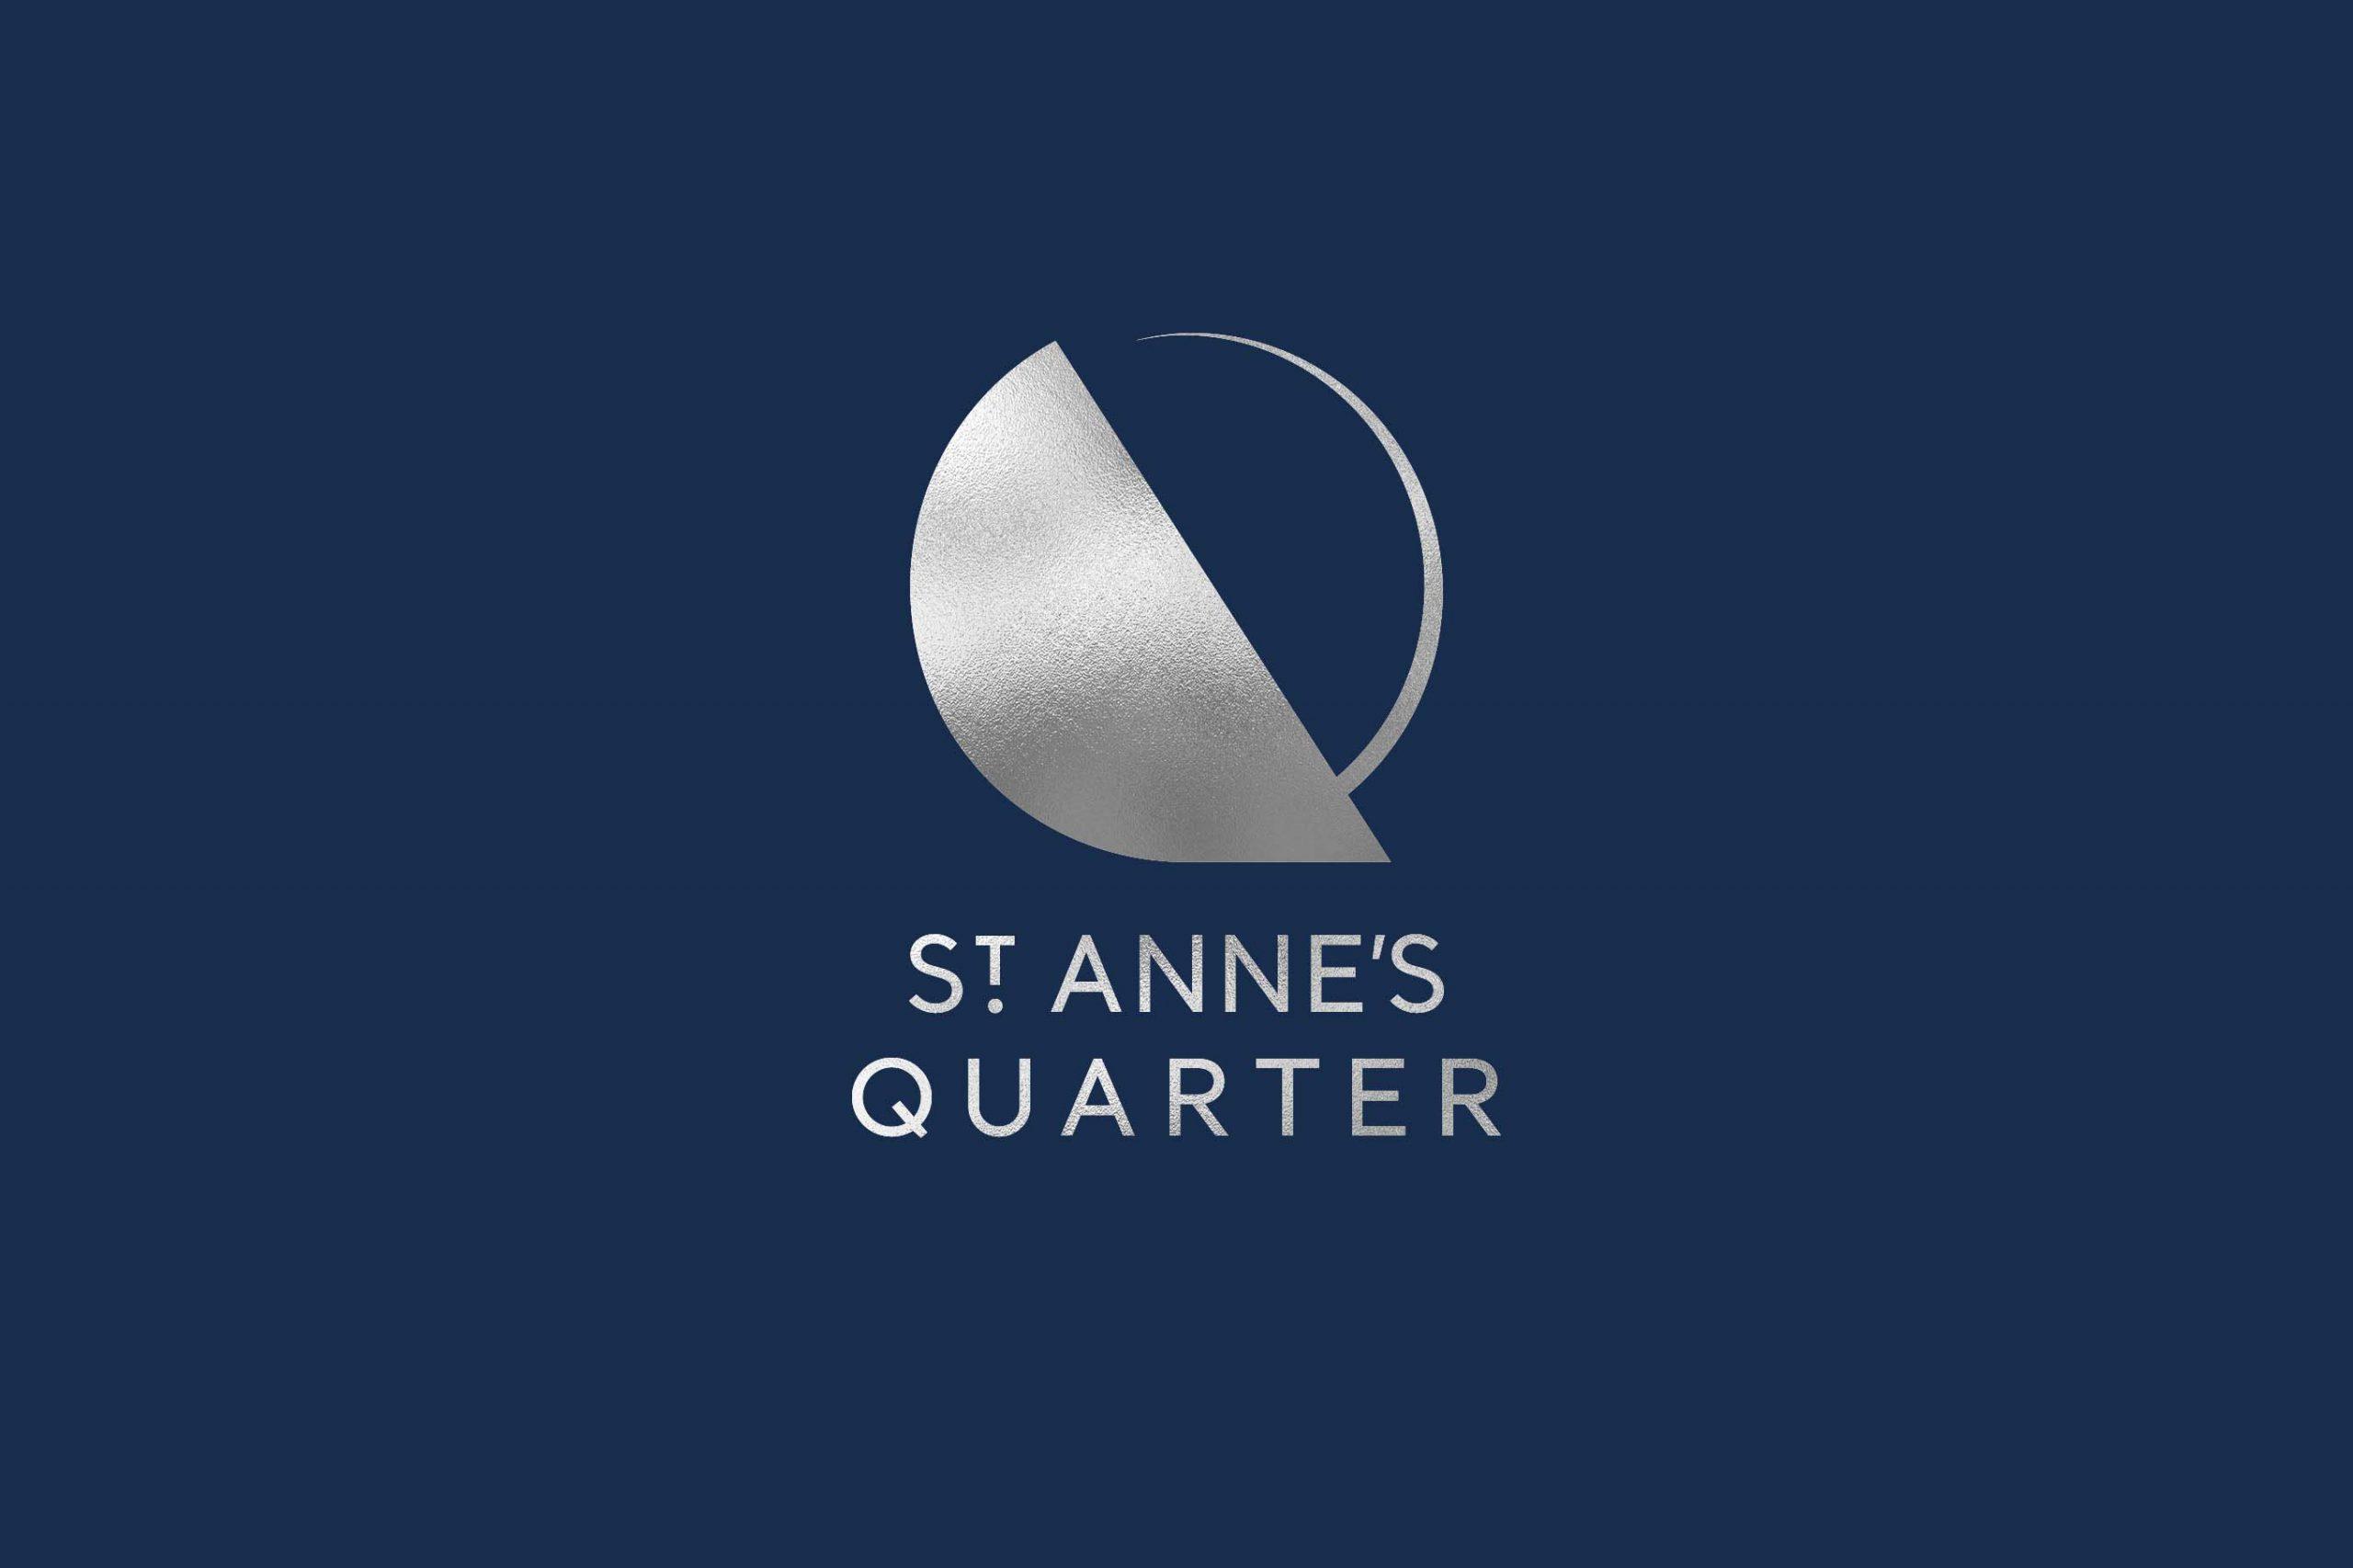 St Anne's Quarter